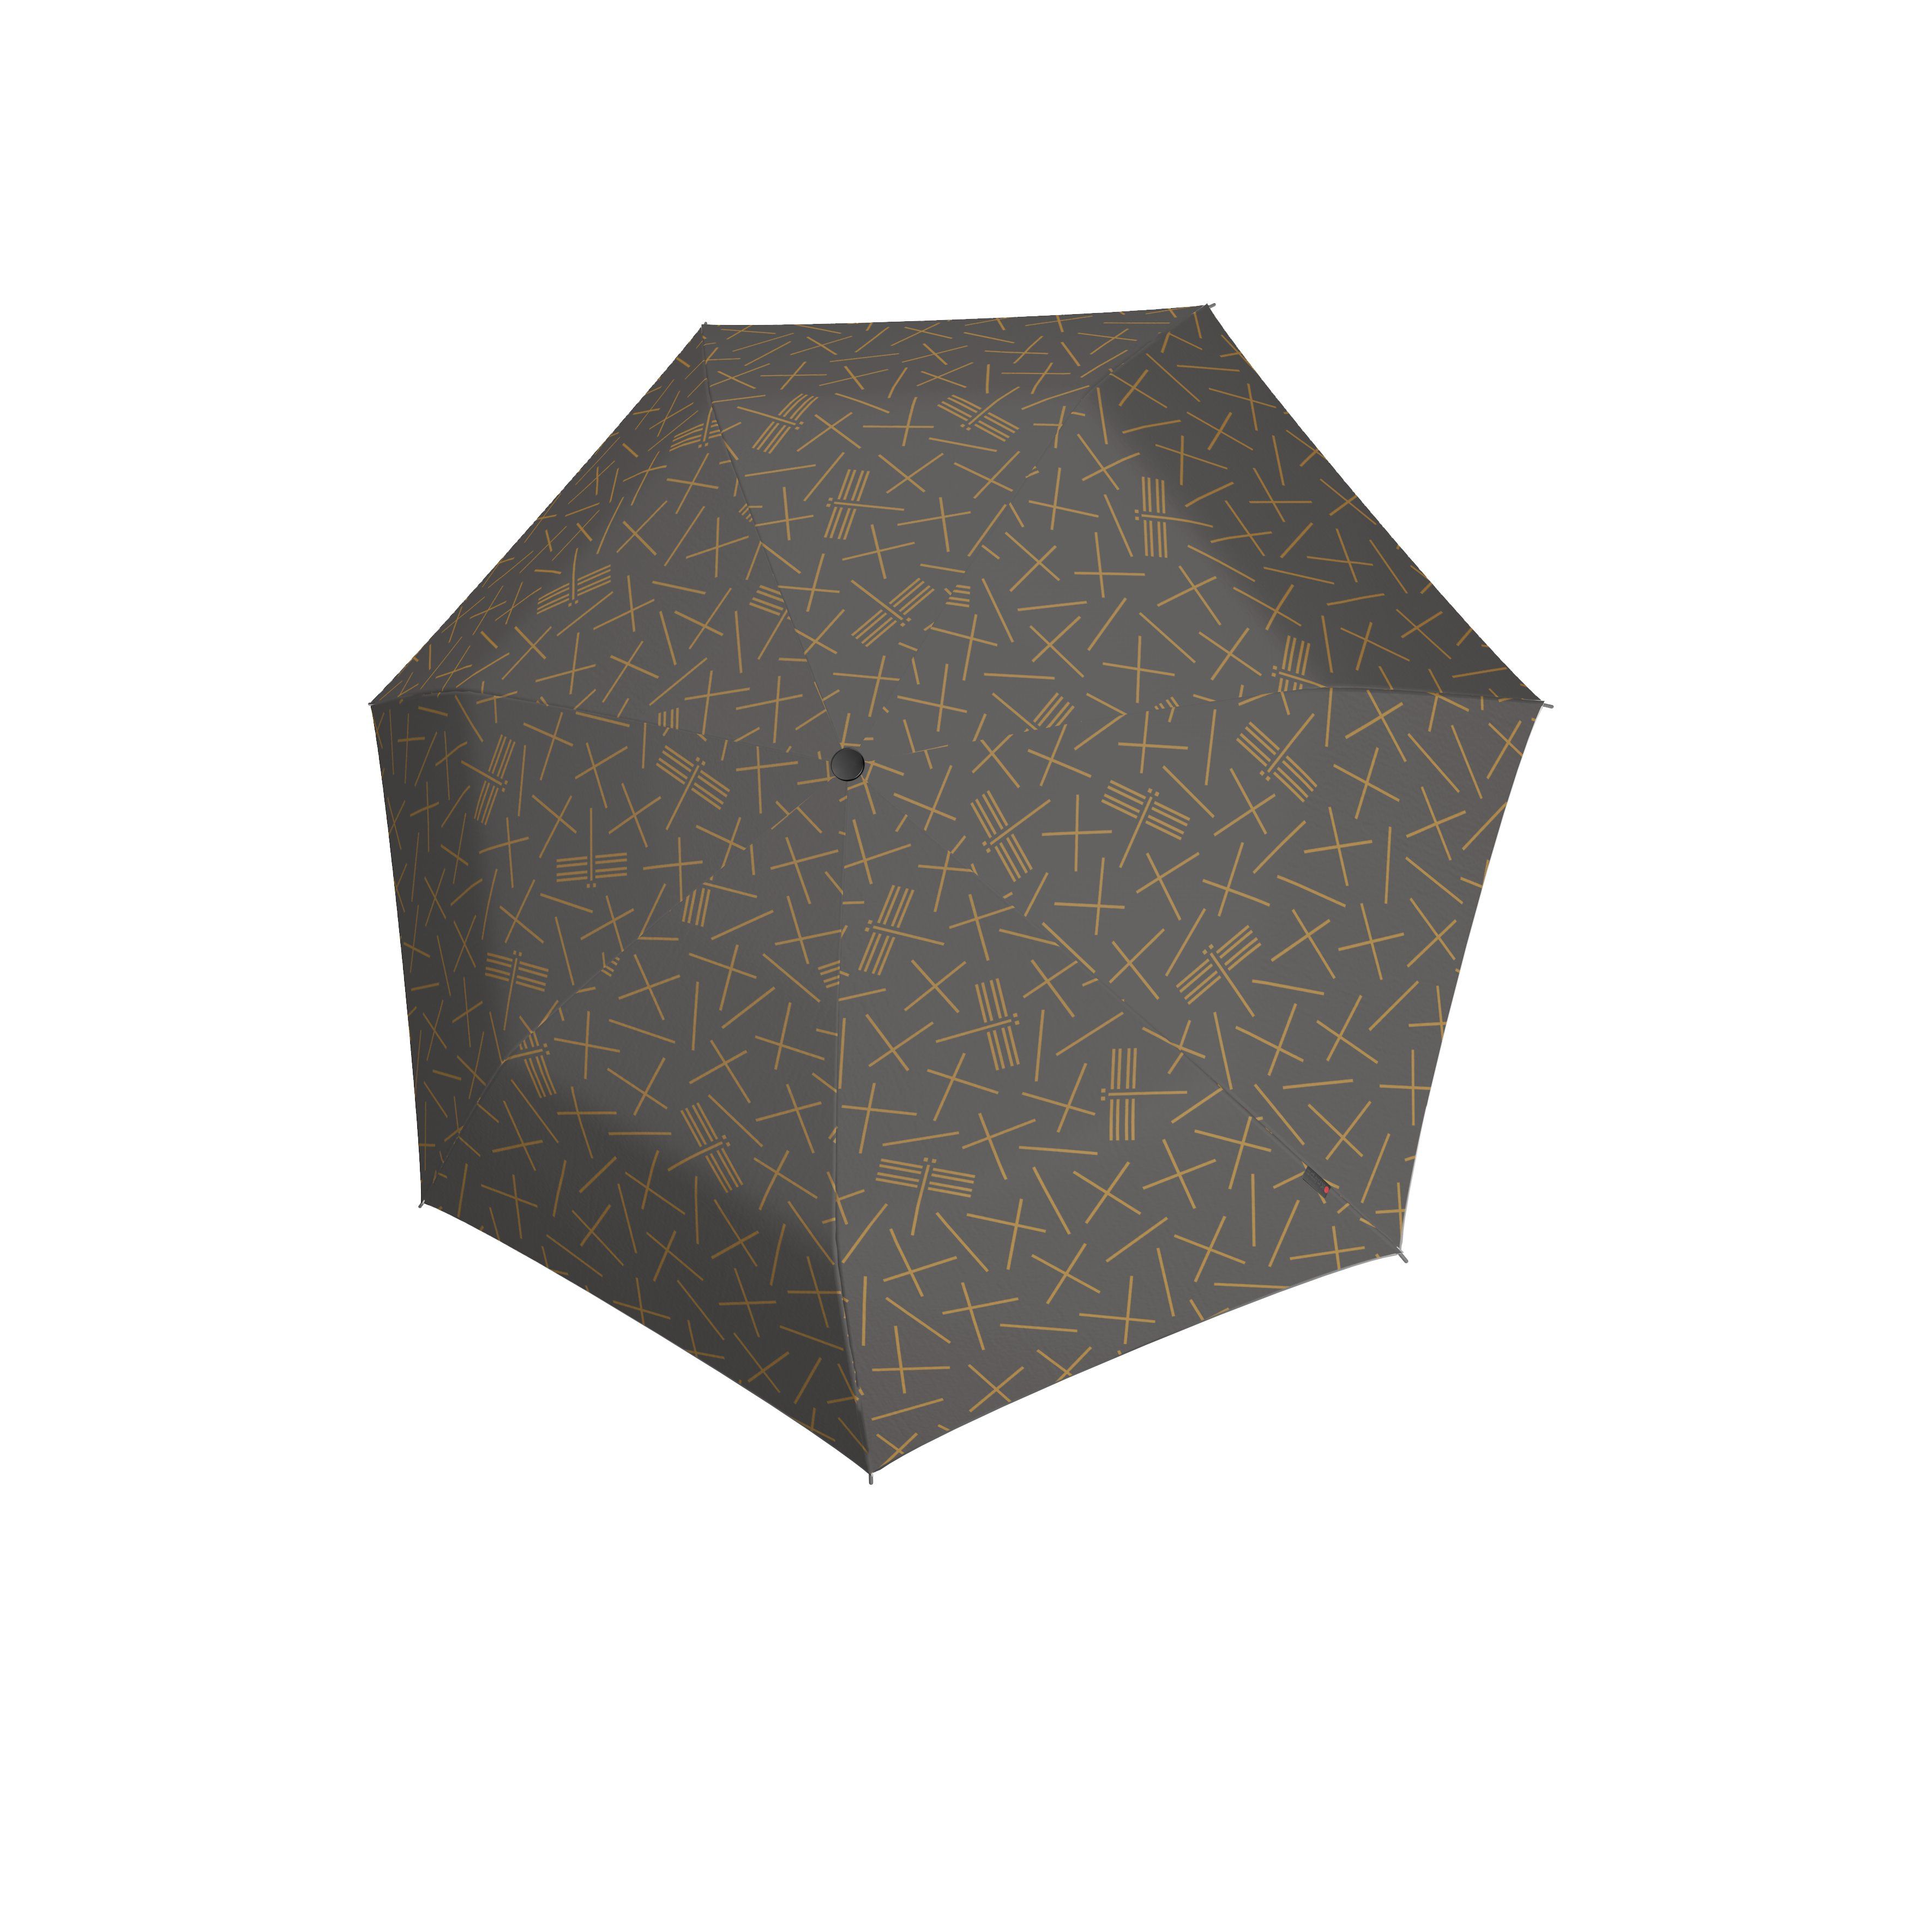 Knirps Umbrella Knirps X1 NUNO tombo stone ecorepel with UV Protection